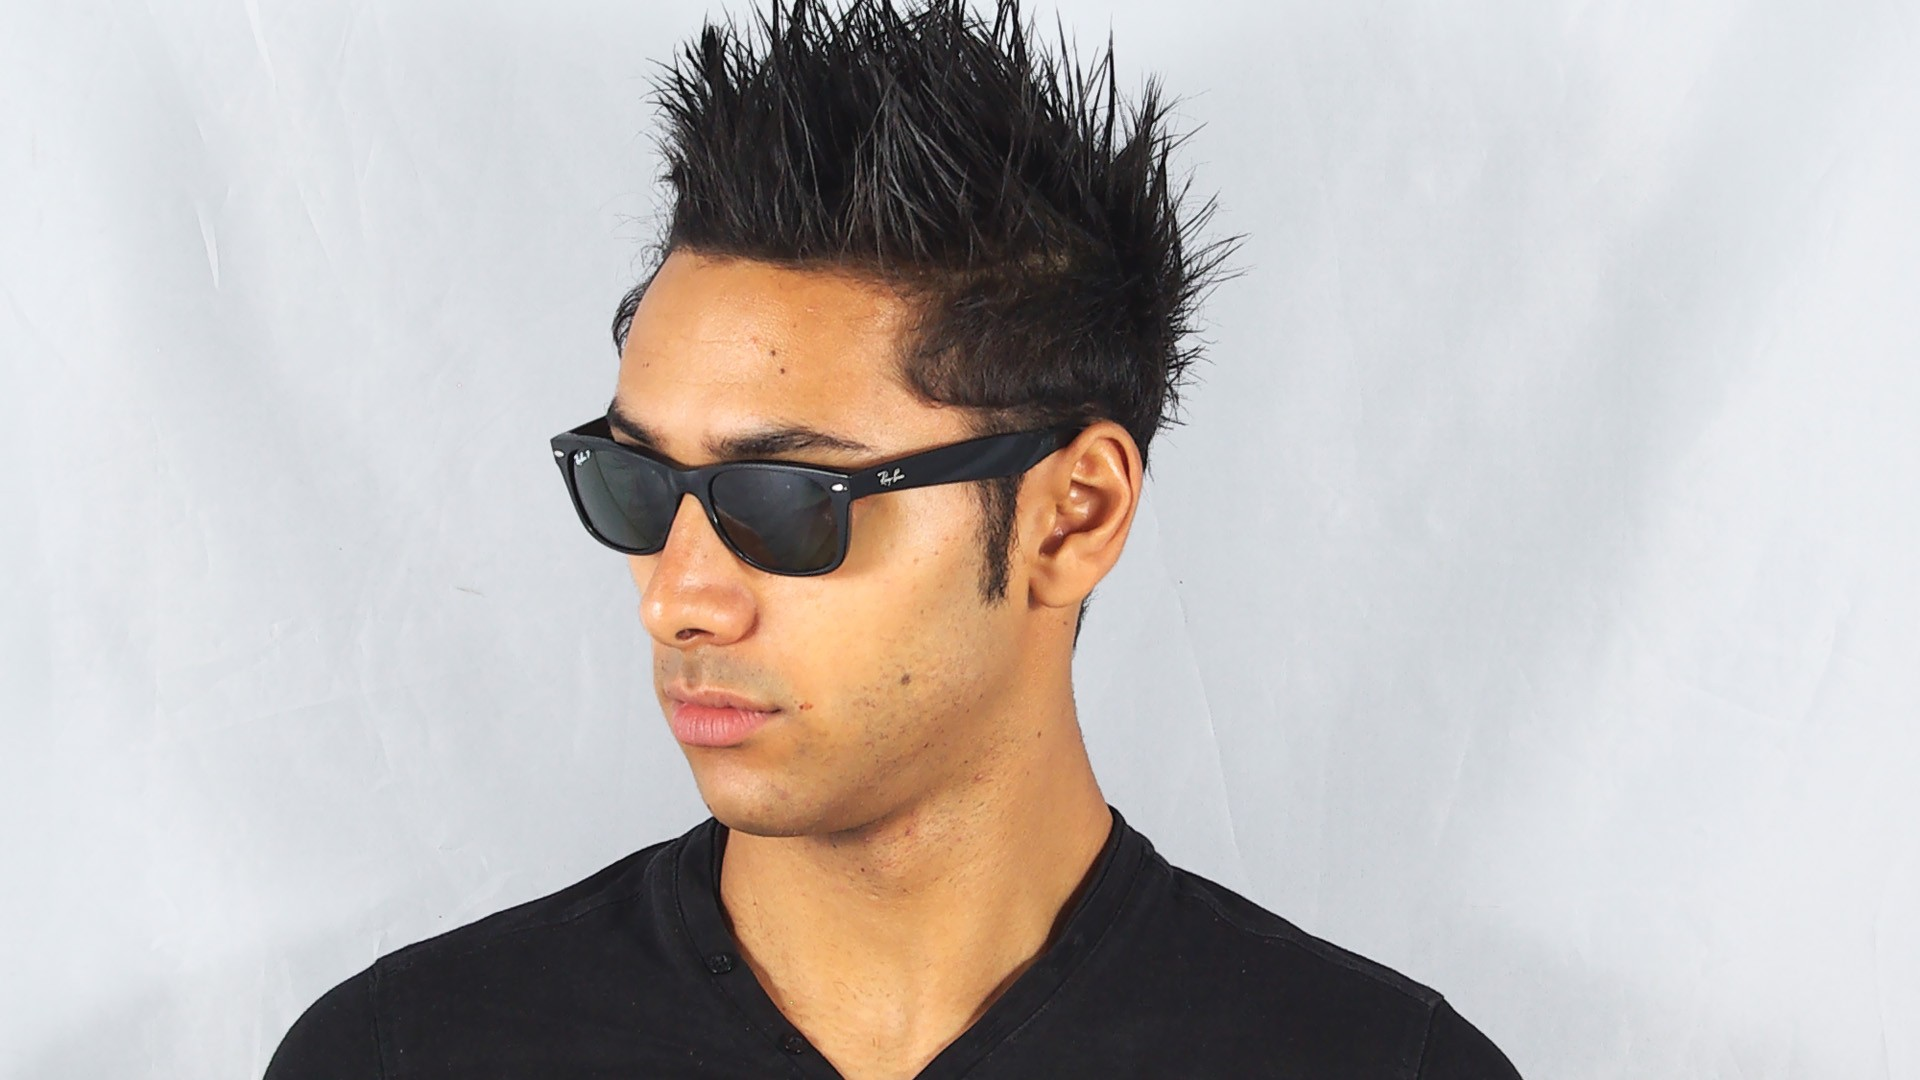 87beffd06 Sunglasses Ray-Ban New Wayfarer Black G15 RB2132 901/58 52-18 Small  Polarized